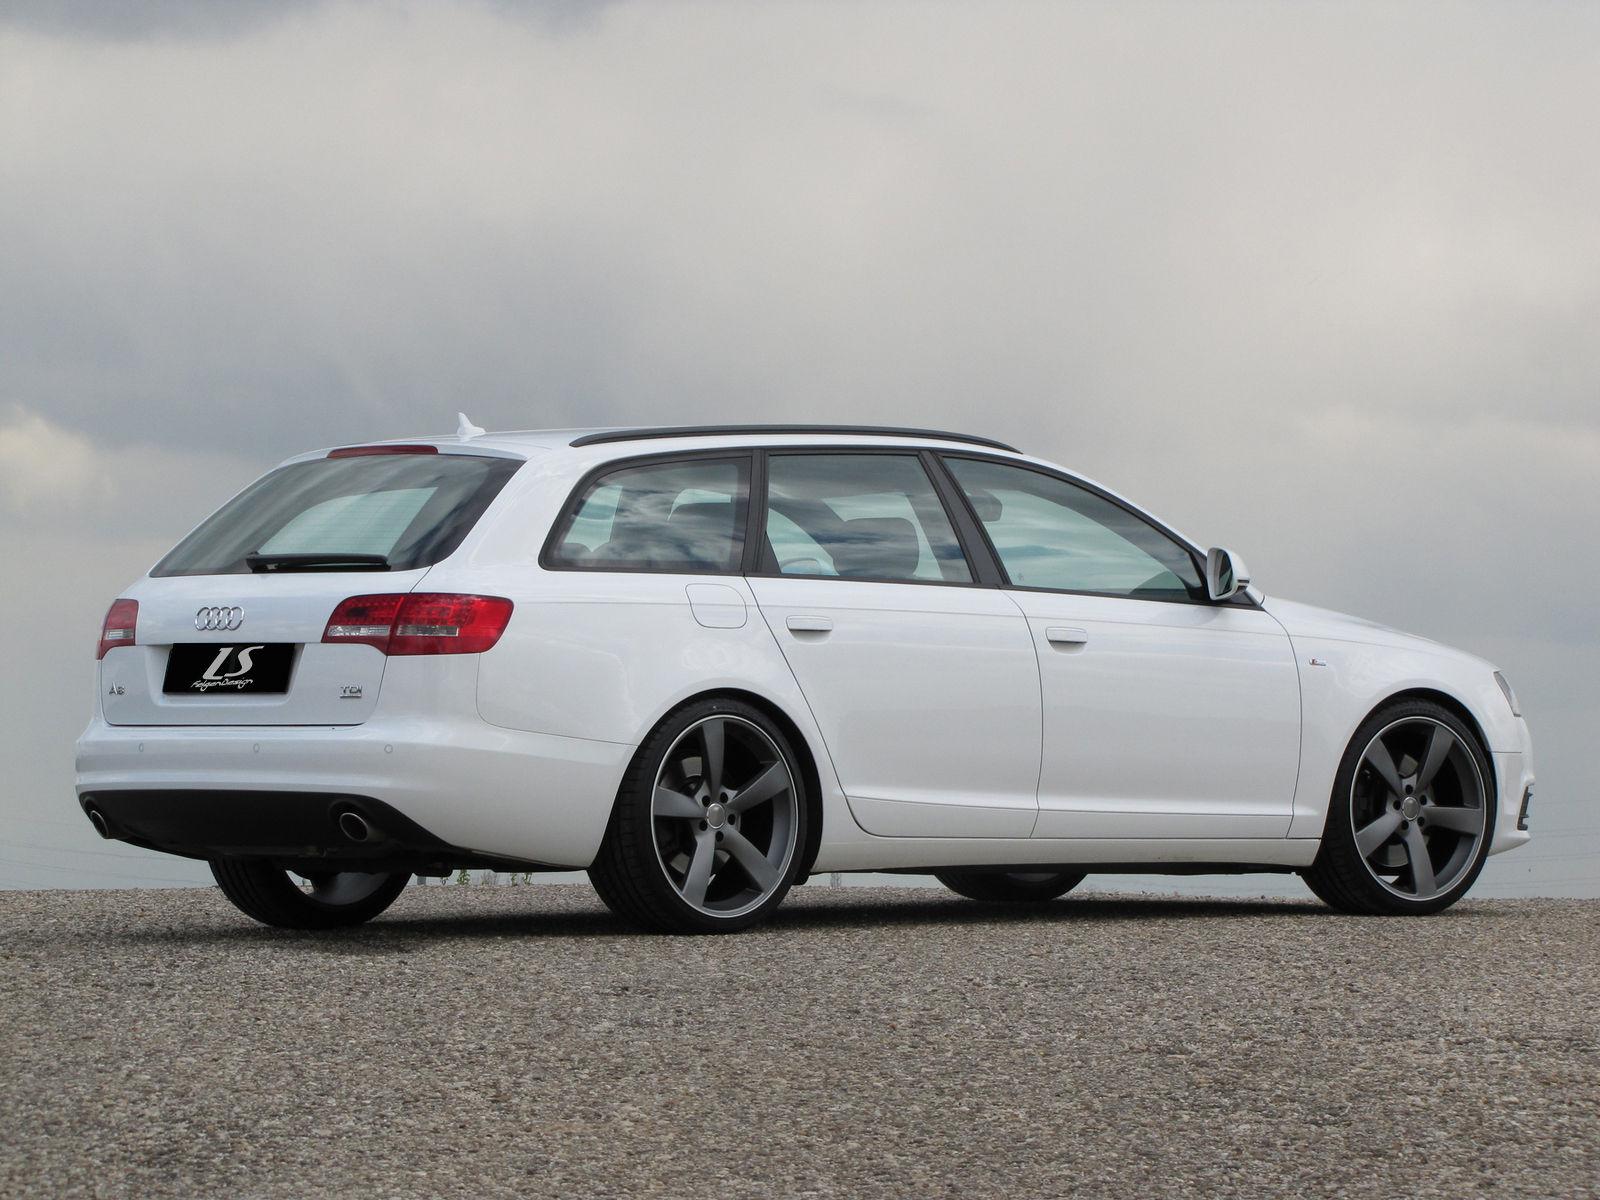 News Alufelgen Audi A6 4b Allroad Mit 19zoll Ls16 Graphit